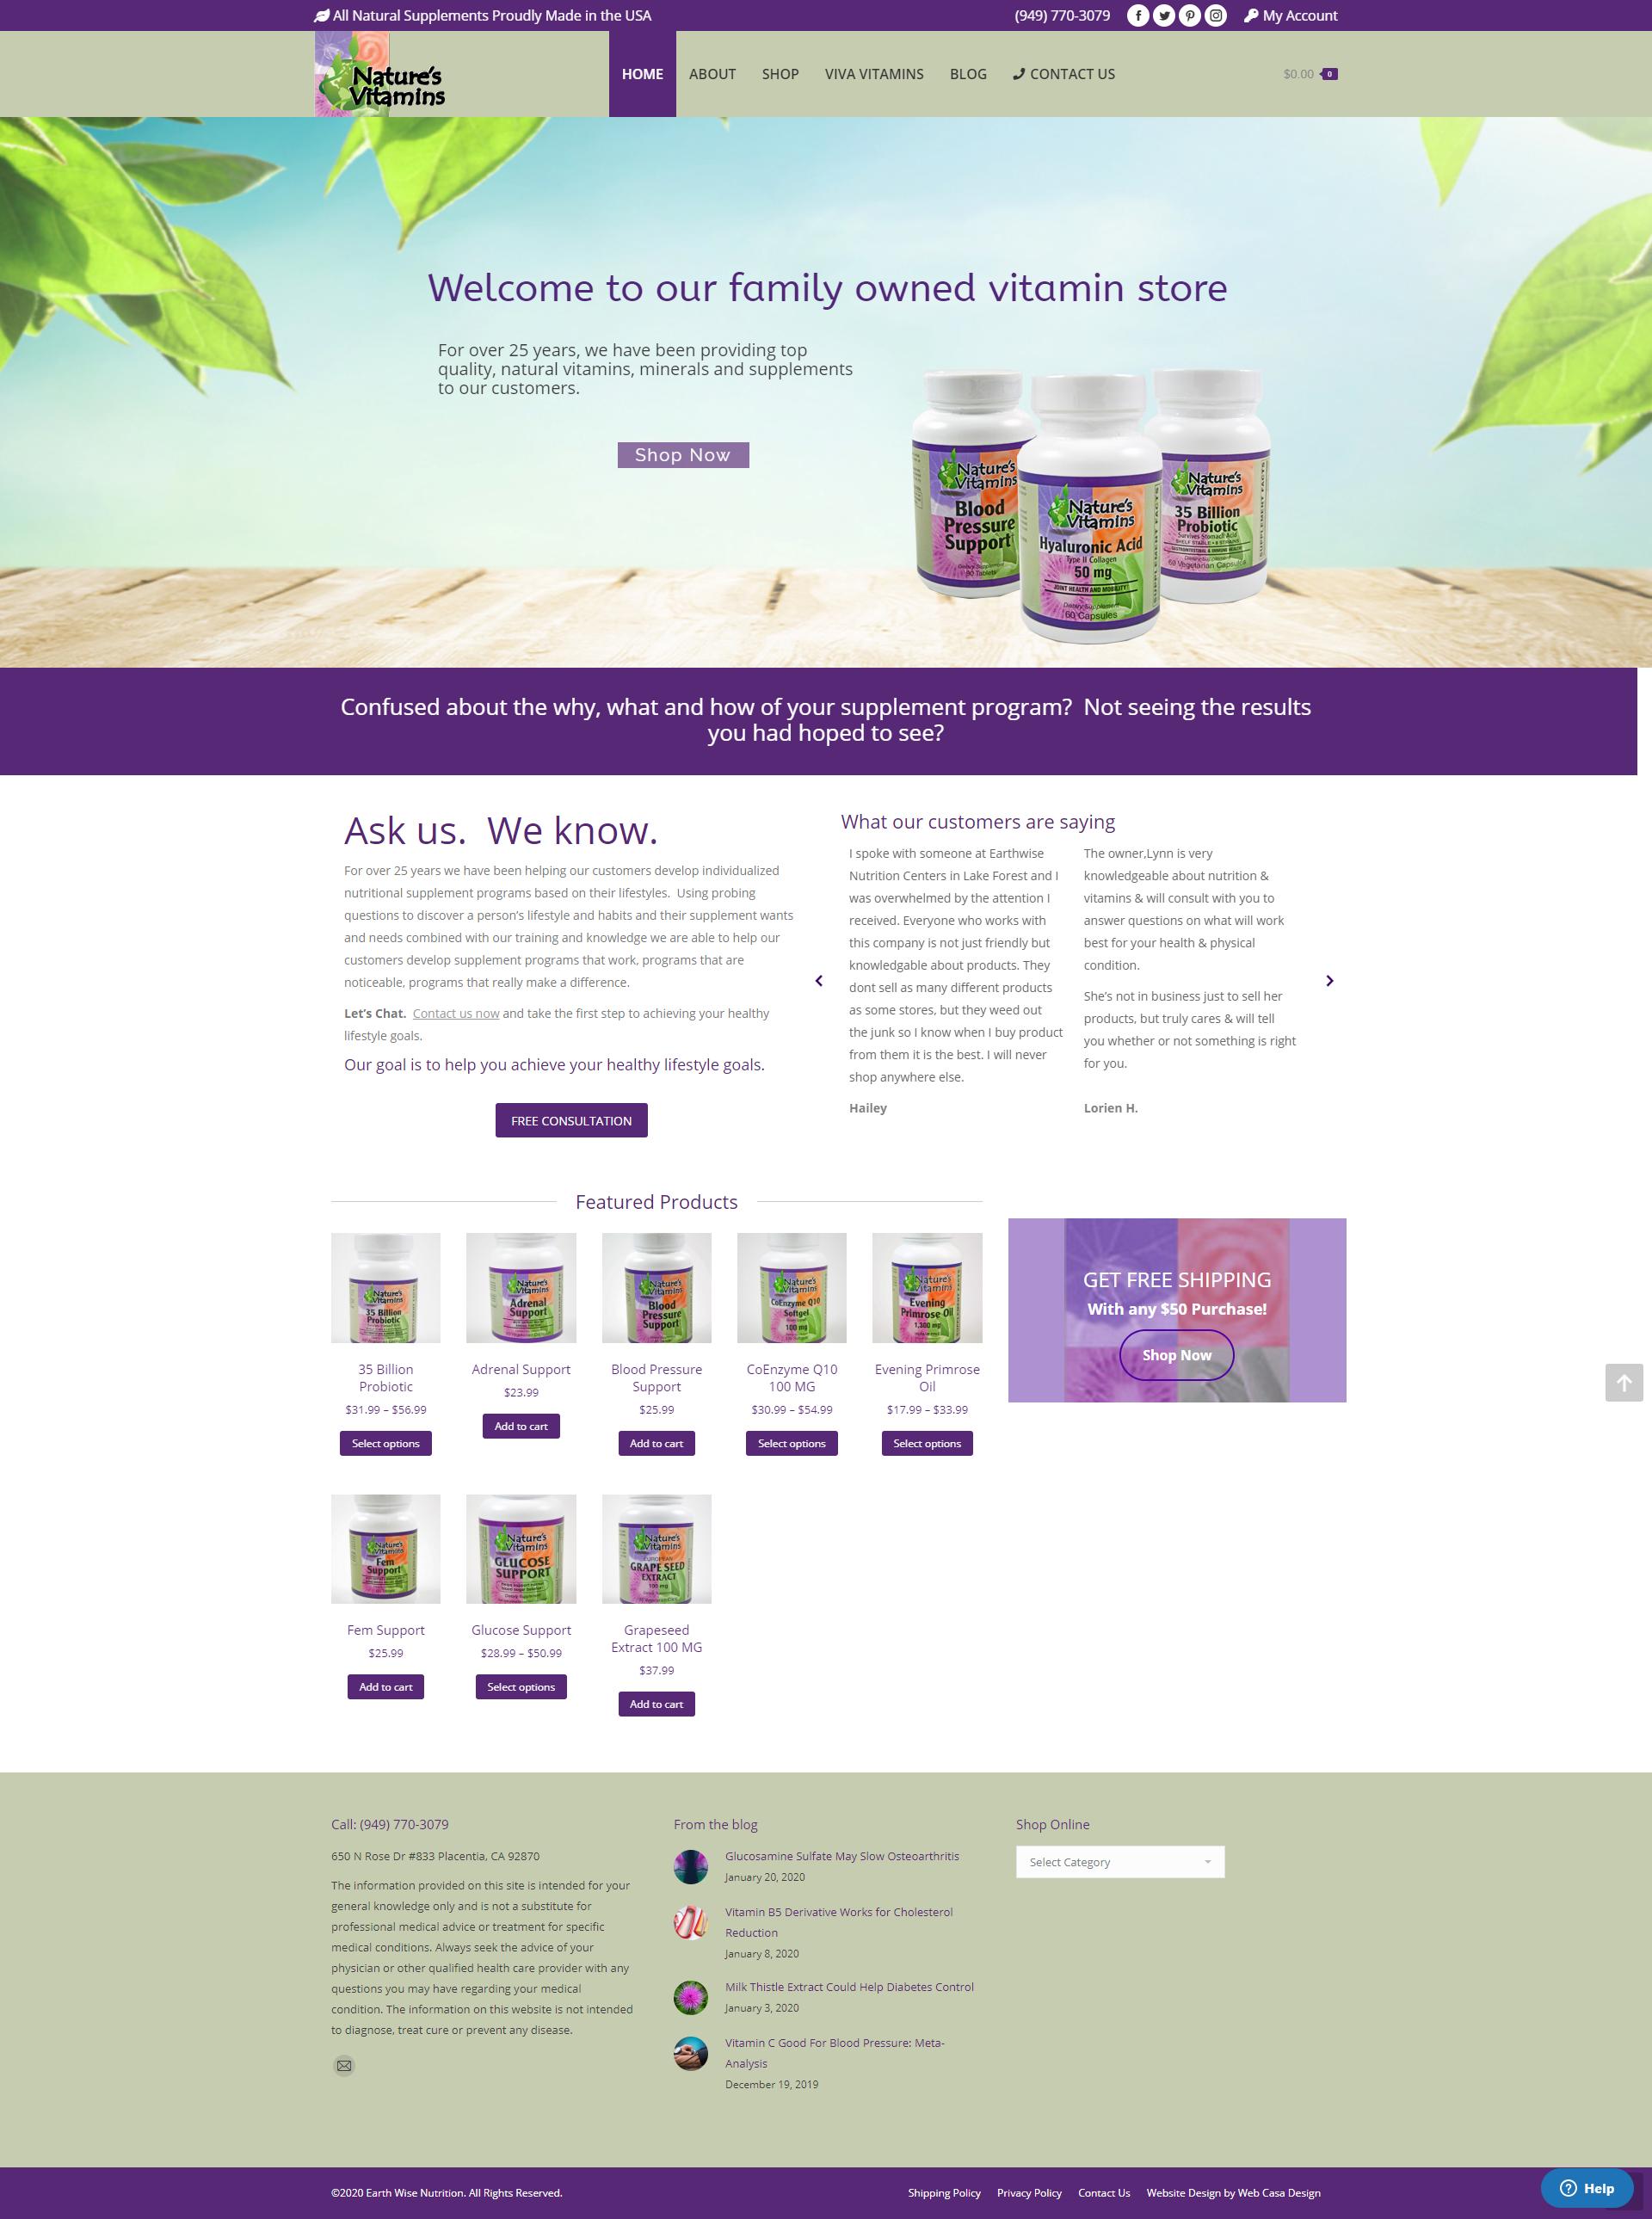 Natures Vitamins Online